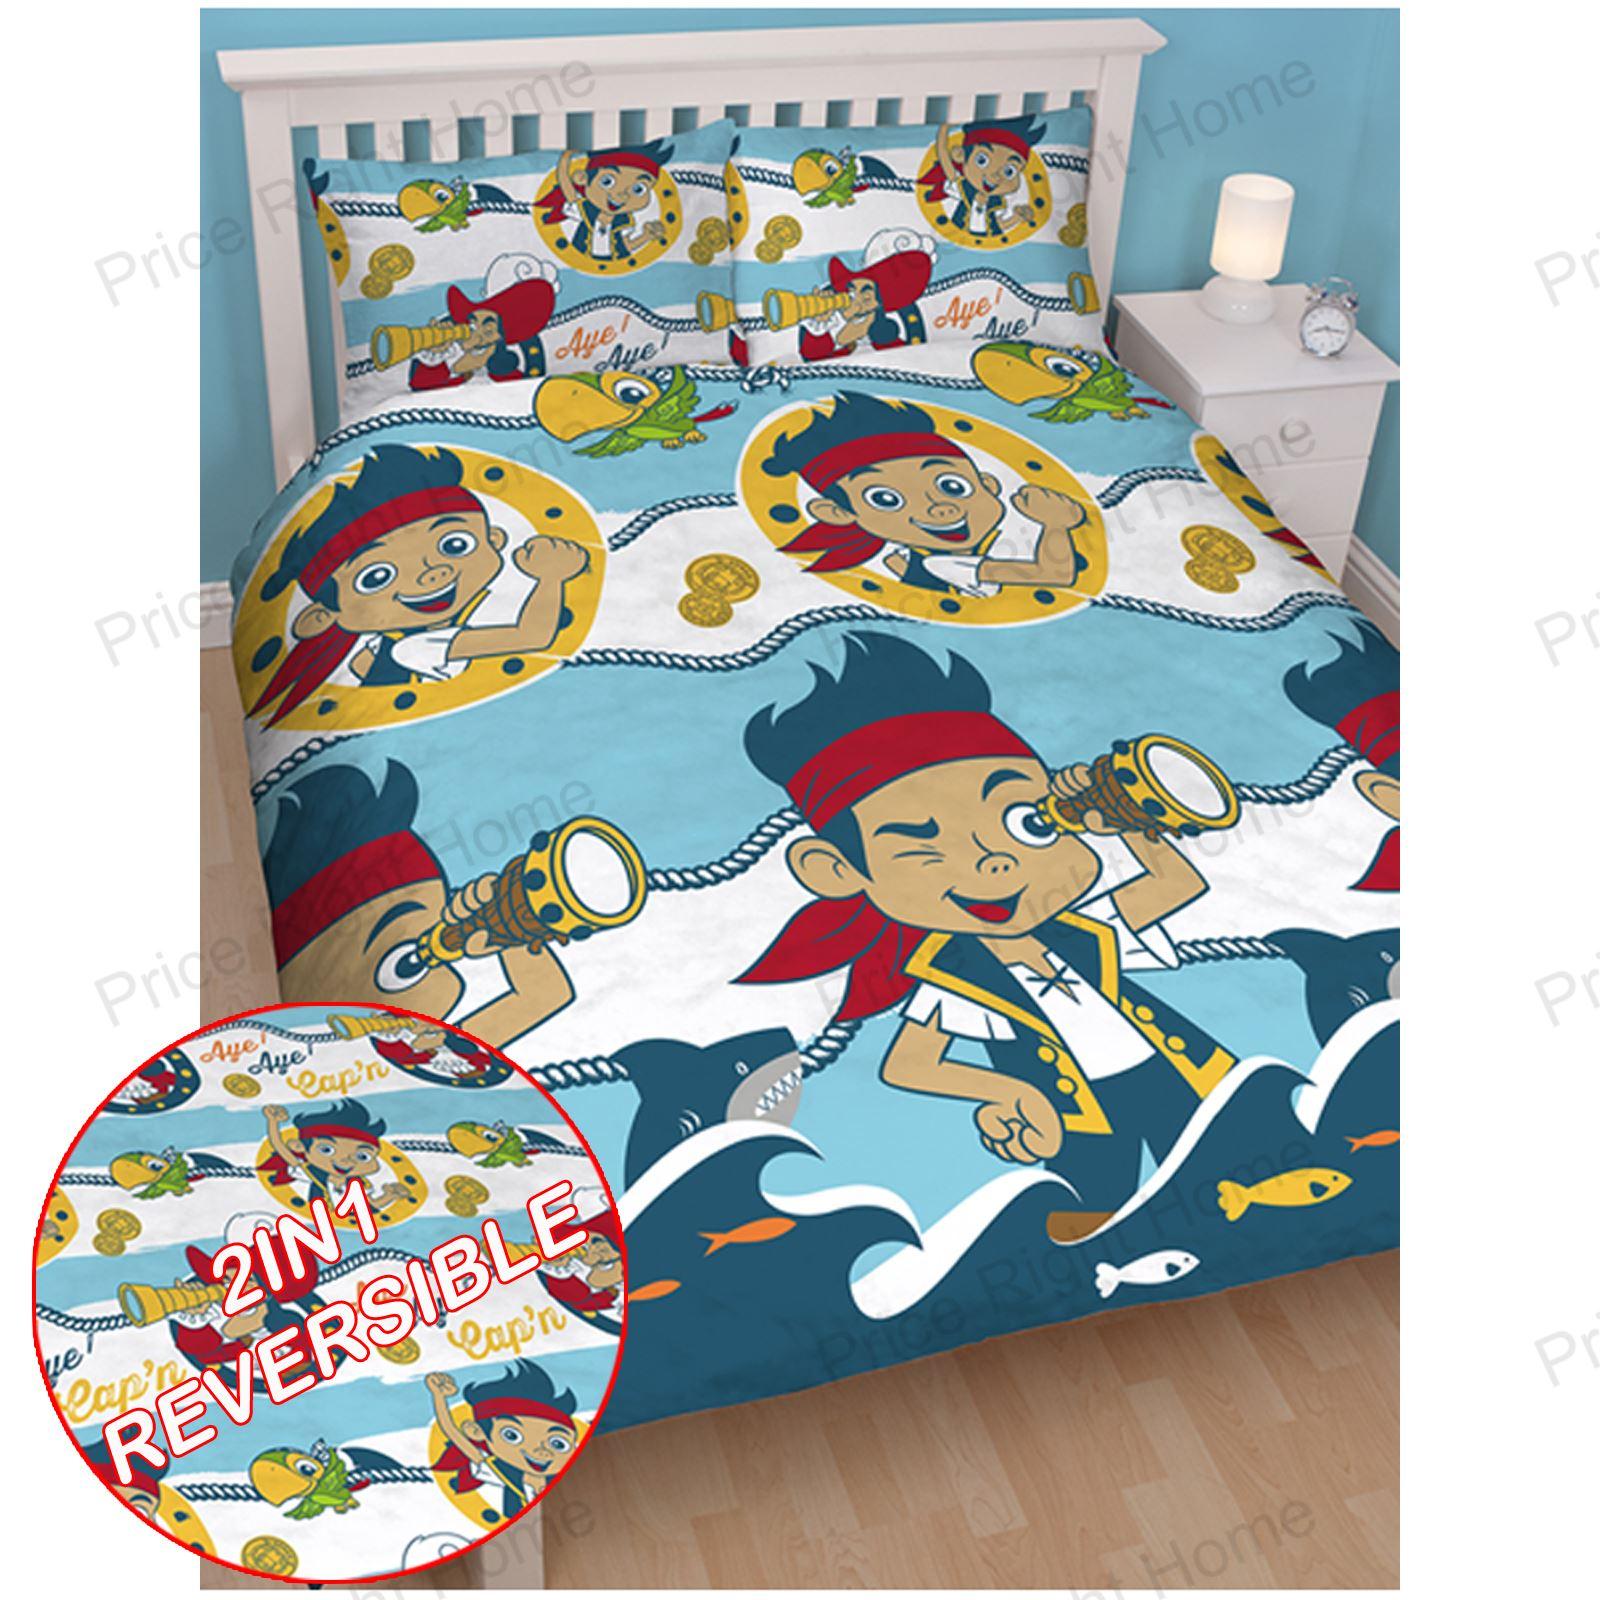 Ninos-Disney-amp-Character-Edredon-Doble-Juego-de-Marvel-Paw-Patrol-Emoji-amp-Mas